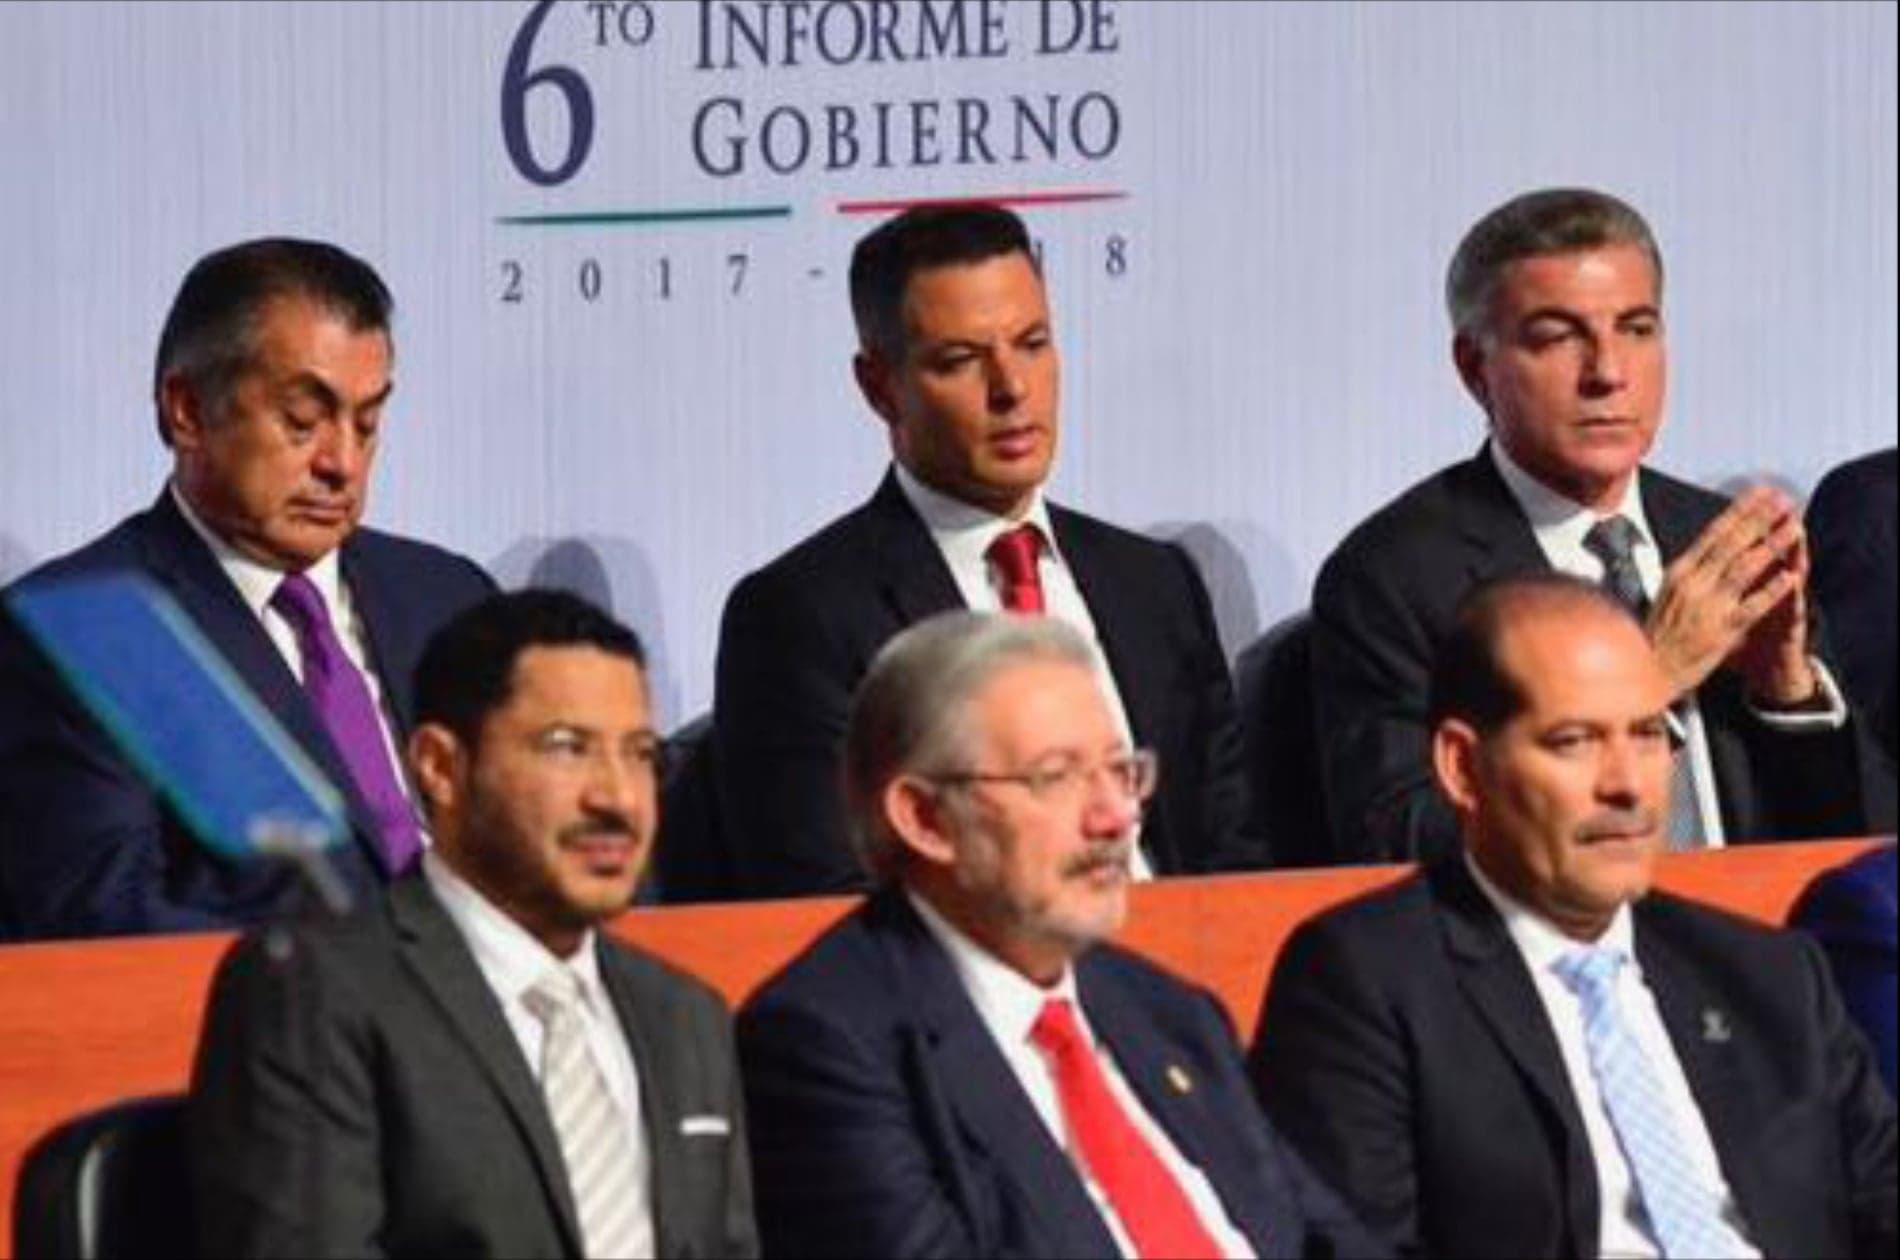 Gobernador de Aguascalientes reconoce trabajo del presidente EPN